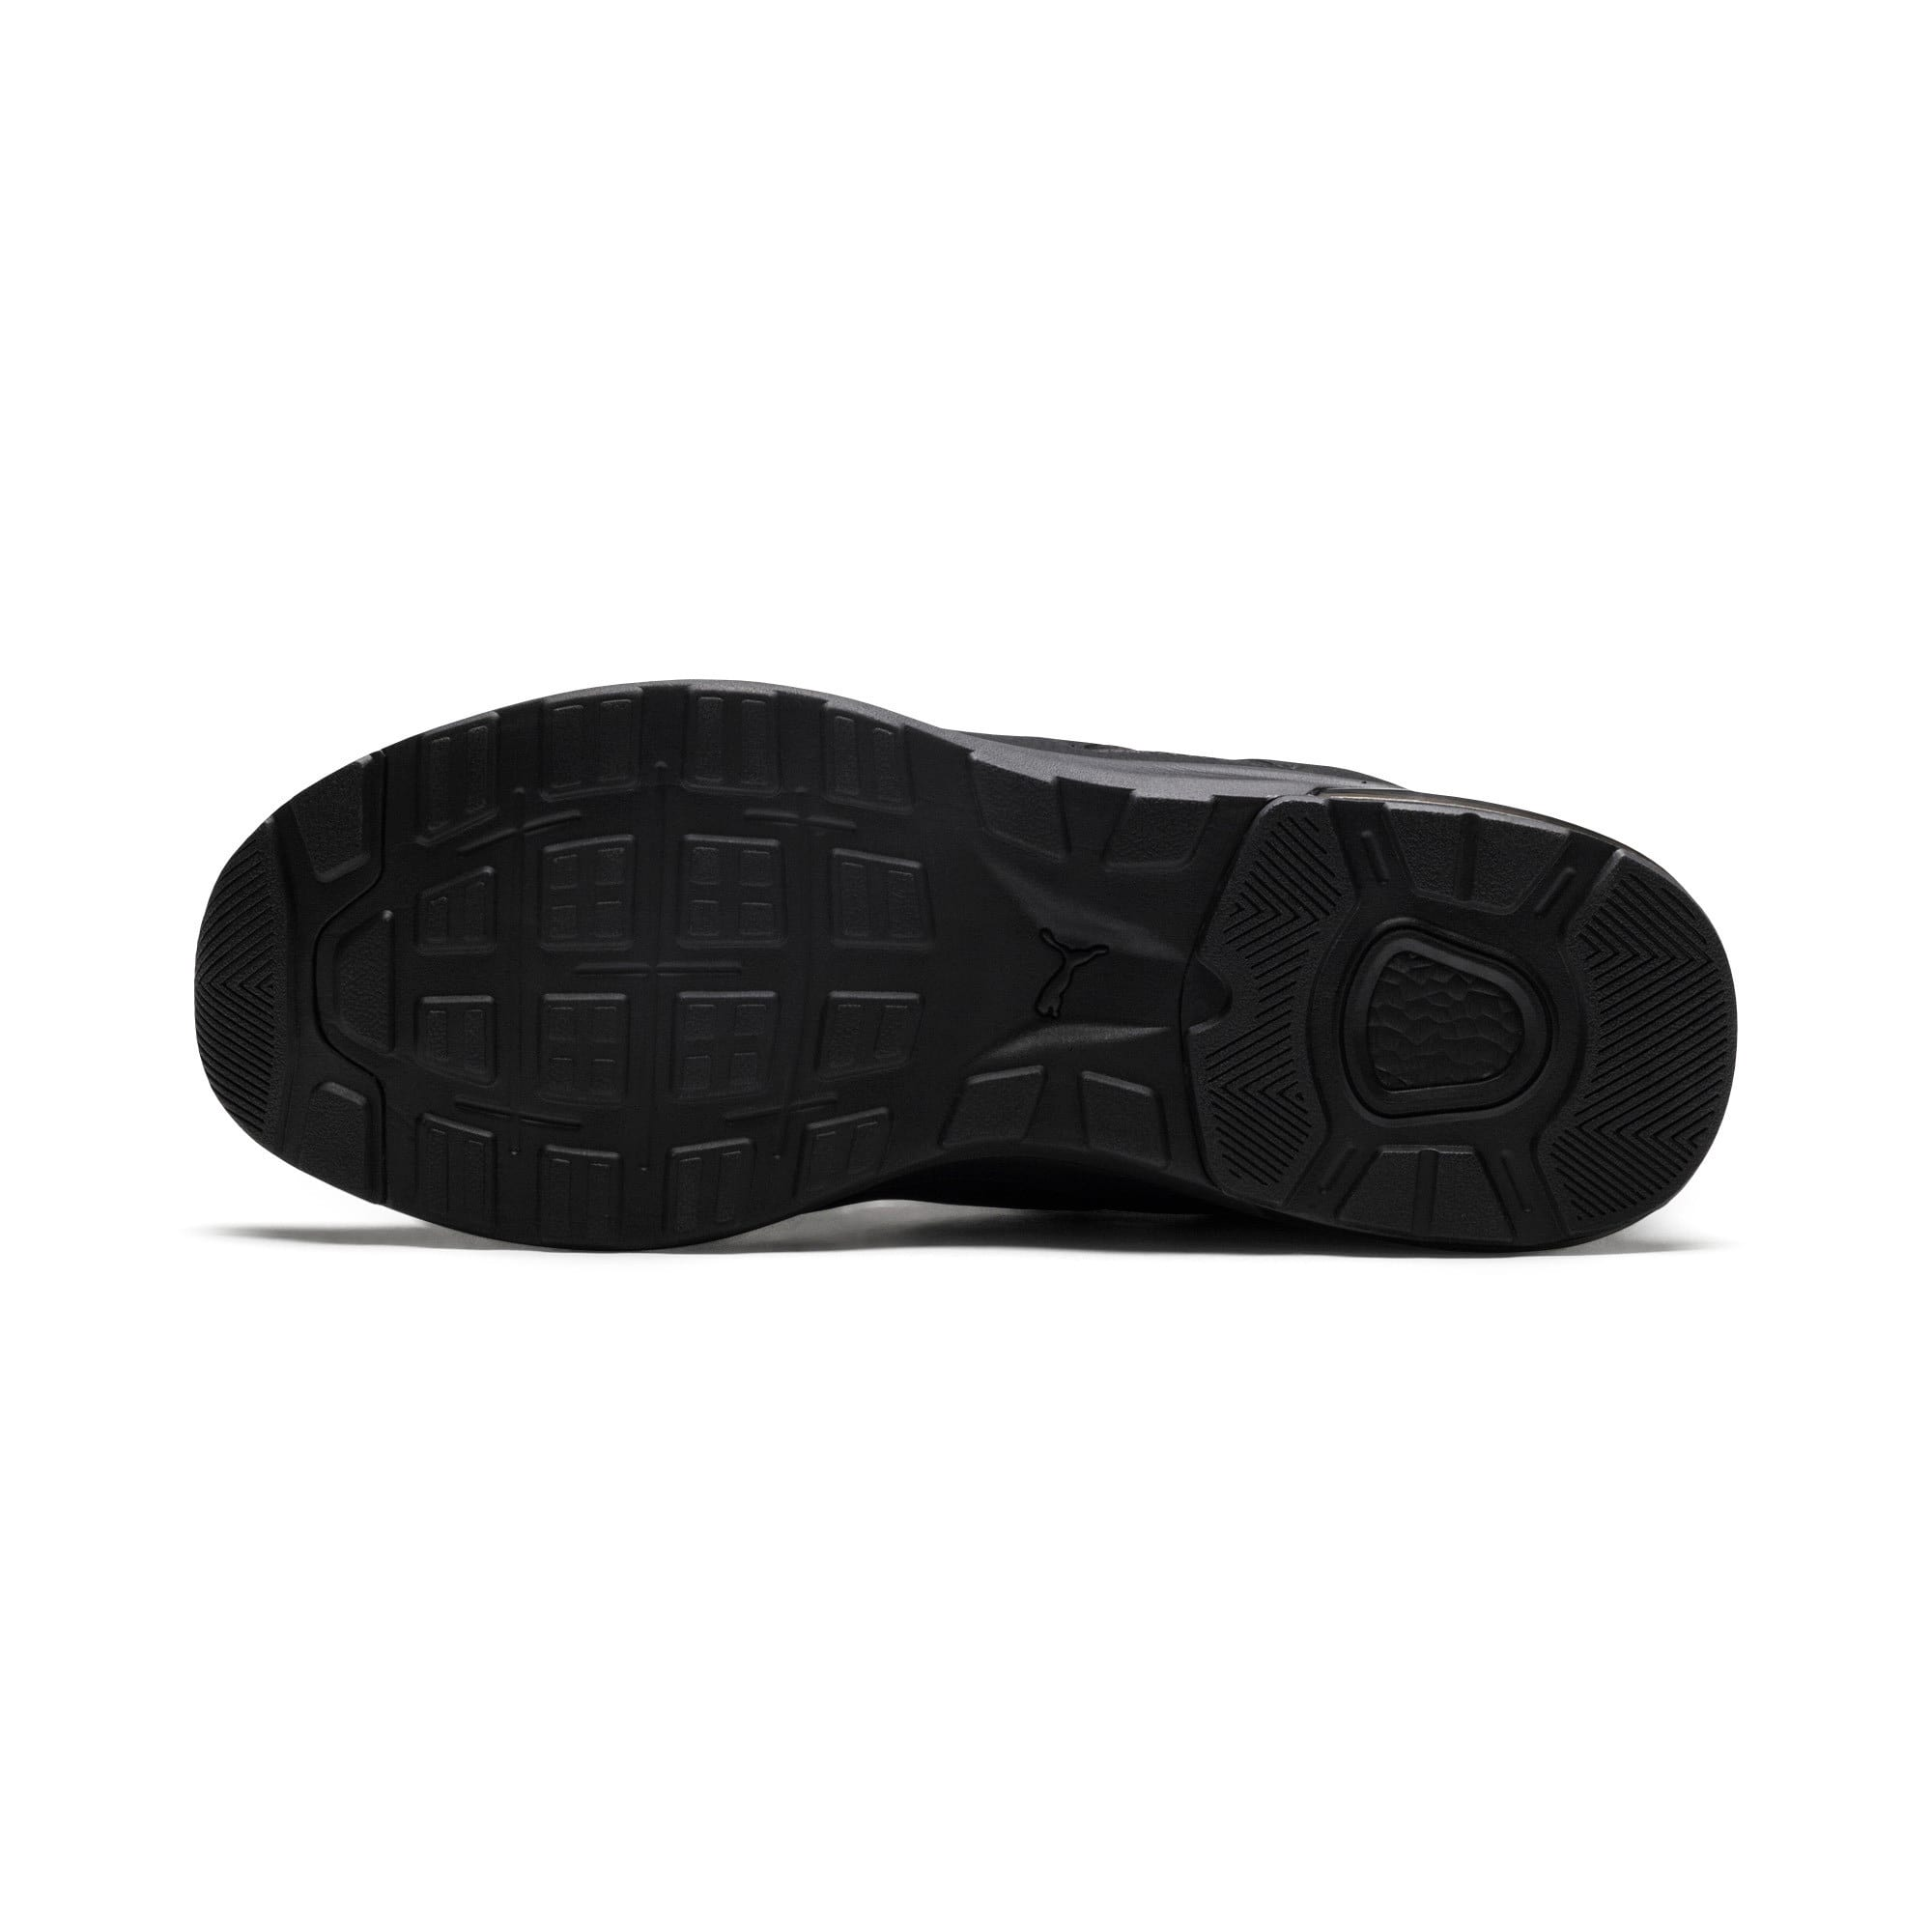 Thumbnail 3 of Electron Street Sneakers, Puma Black-Puma Black-Black, medium